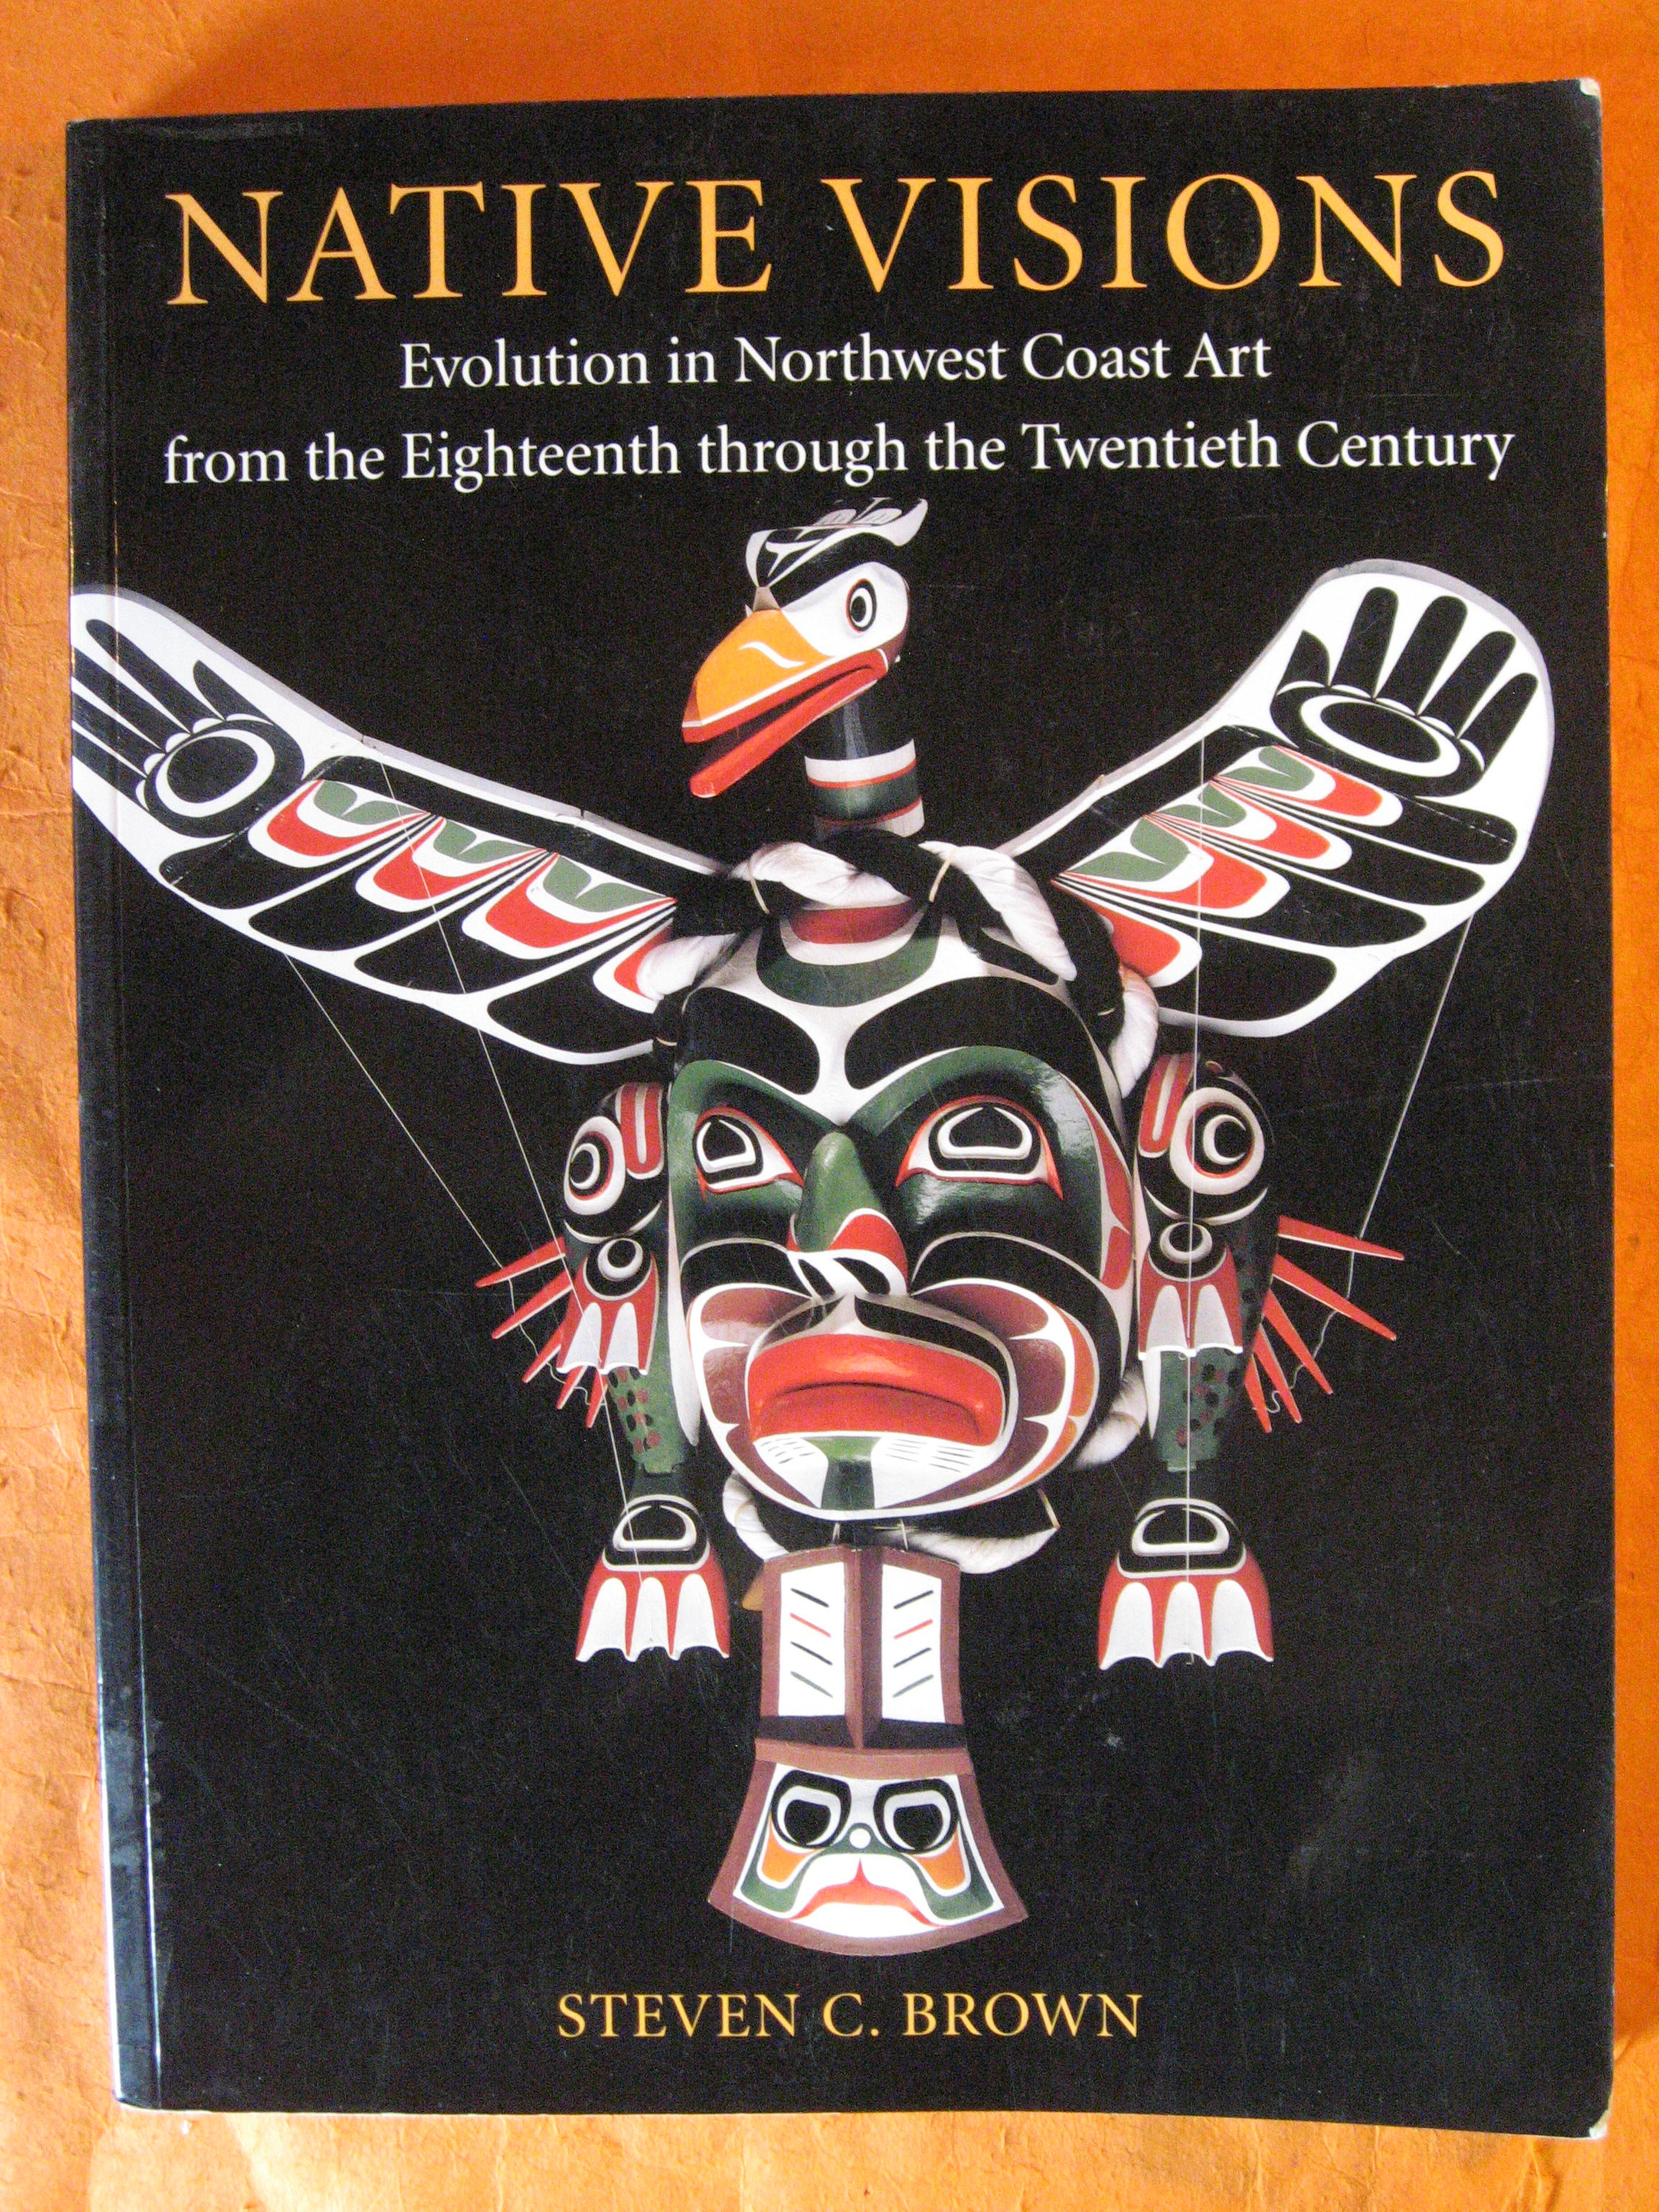 Native Visions: Evolution in Northwest Coast Art from the Eighteenth through the Twentieth Century